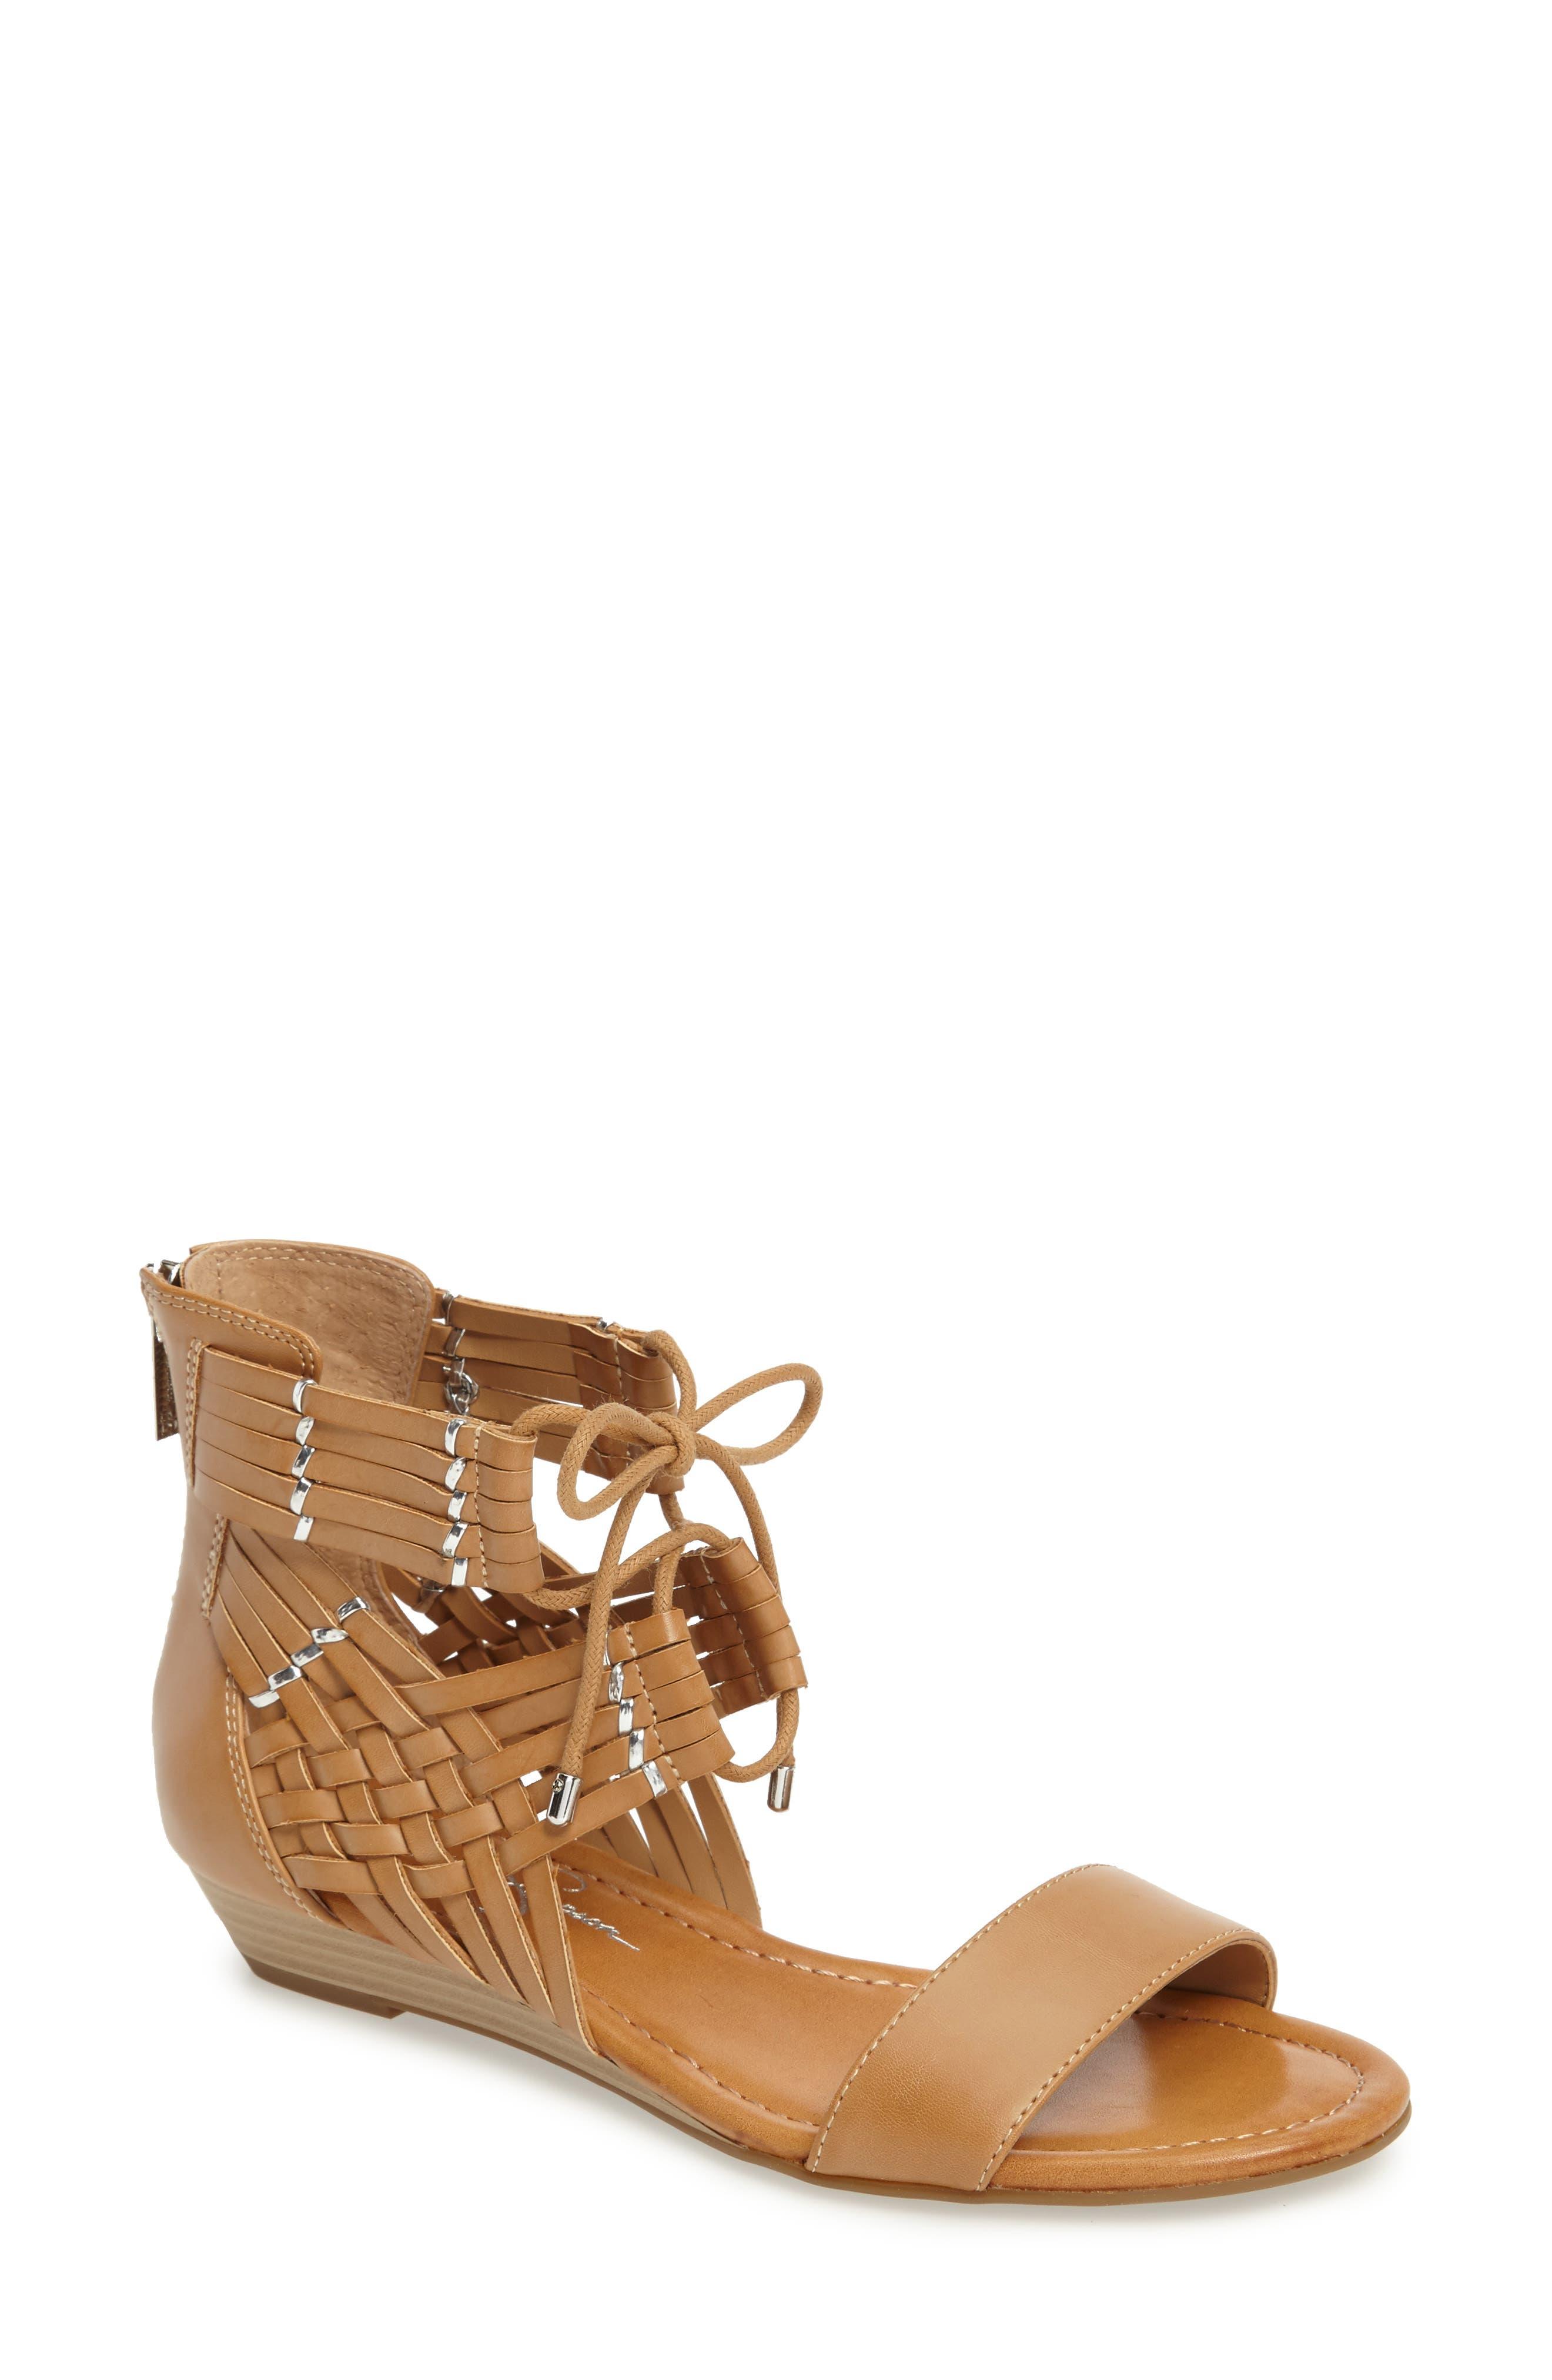 Alternate Image 1 Selected - Jessica Simpson Lourra Woven Sandal (Women)